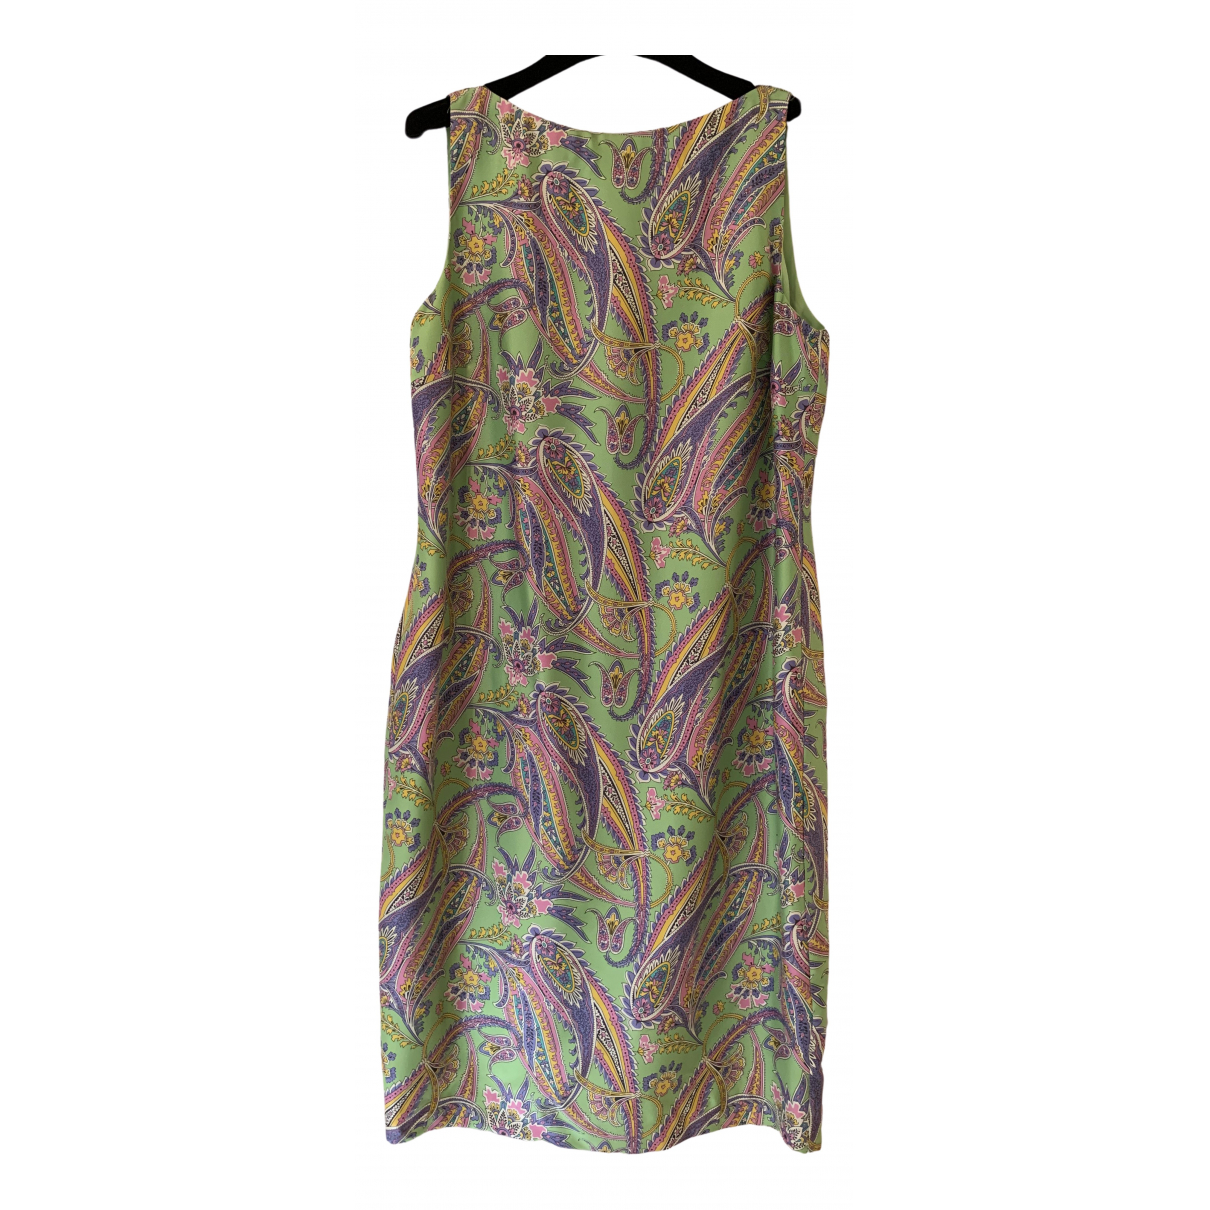 Lauren Ralph Lauren - Robe   pour femme en soie - multicolore